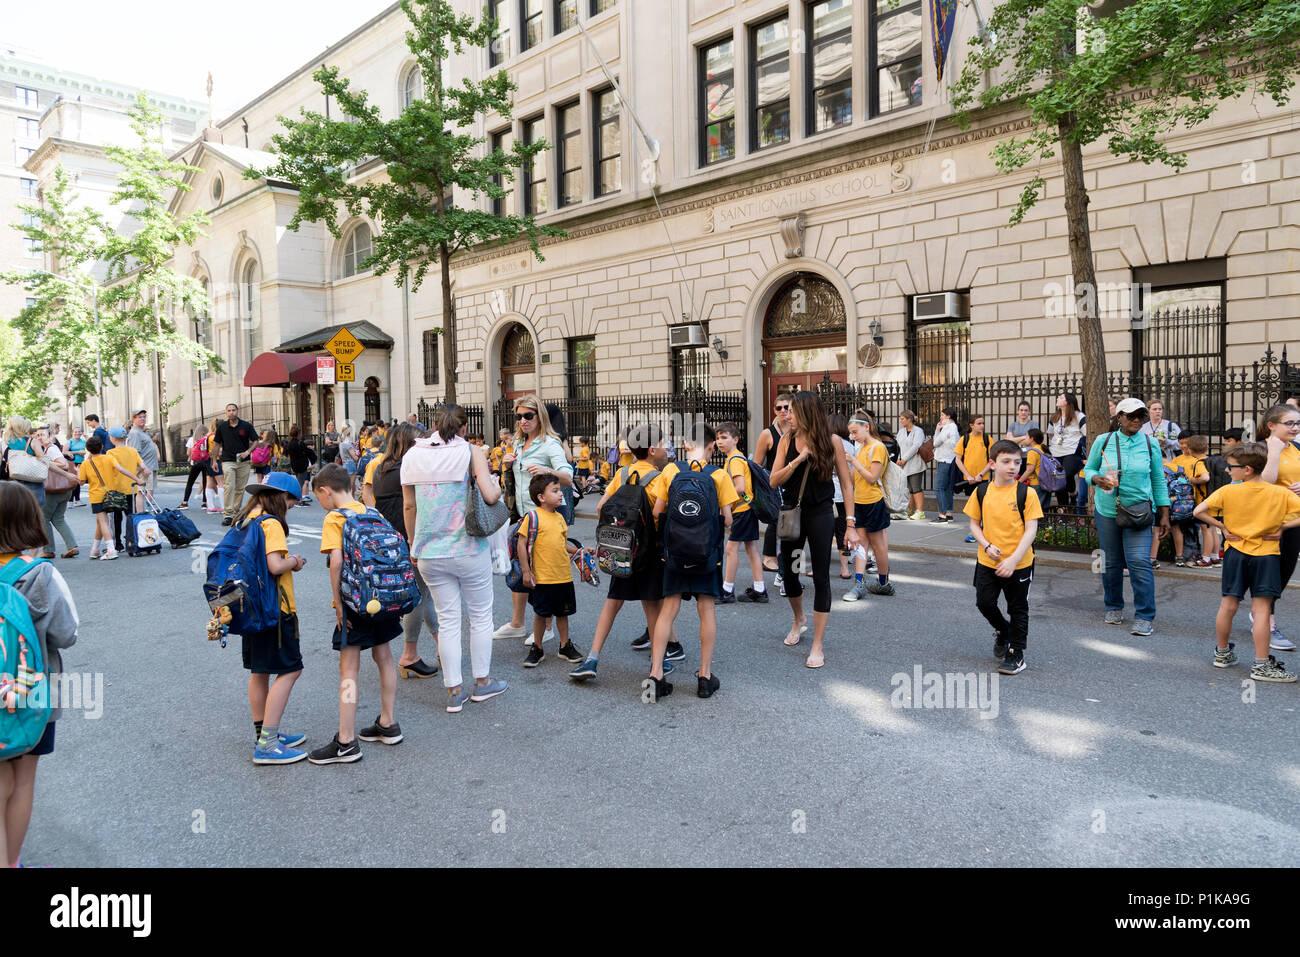 Manhattan, New York, USA 2018. Schoolchildren being met by parents after school - Stock Image